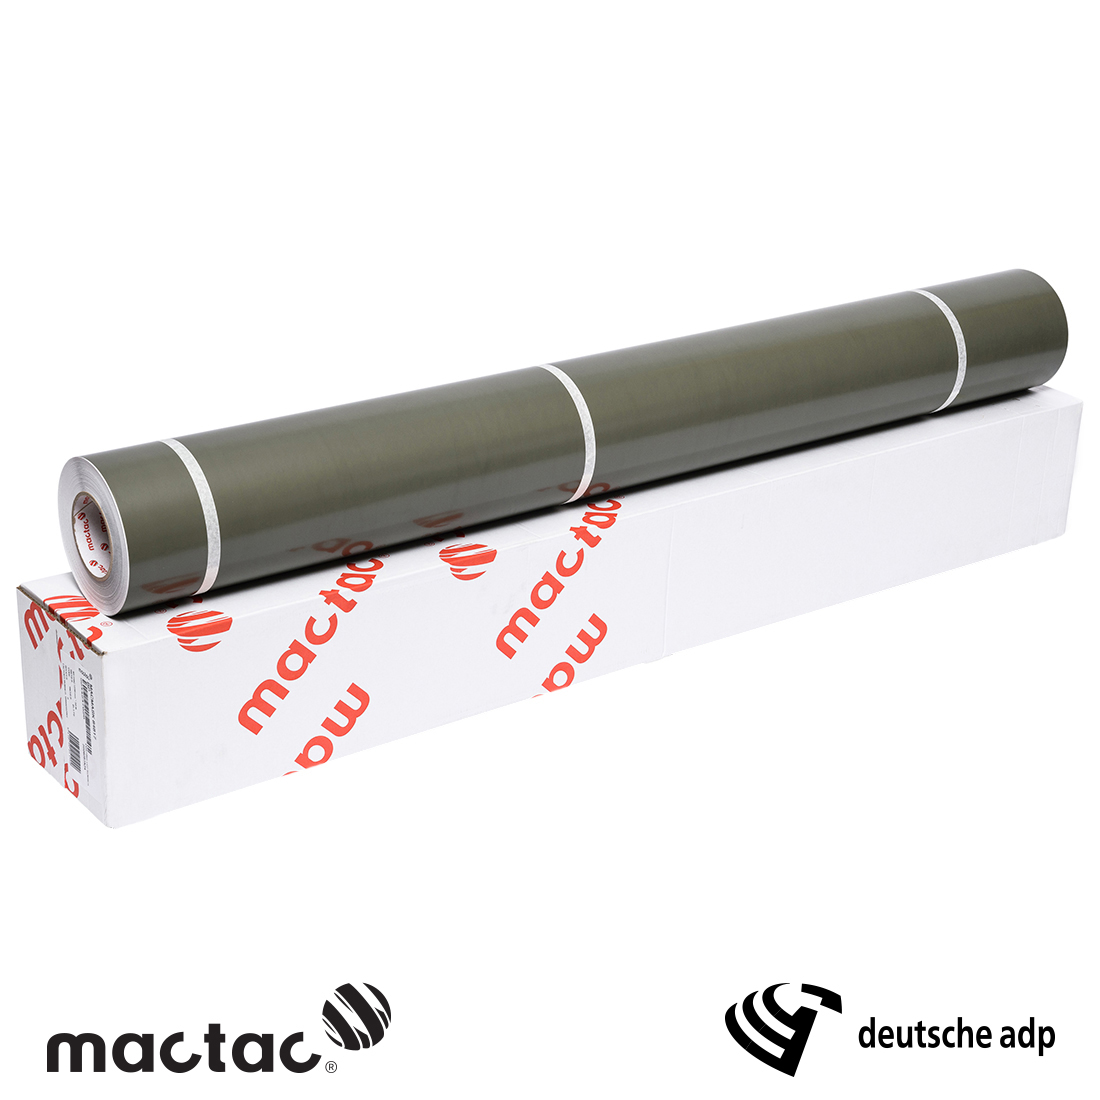 Mactac MACmask 84.817